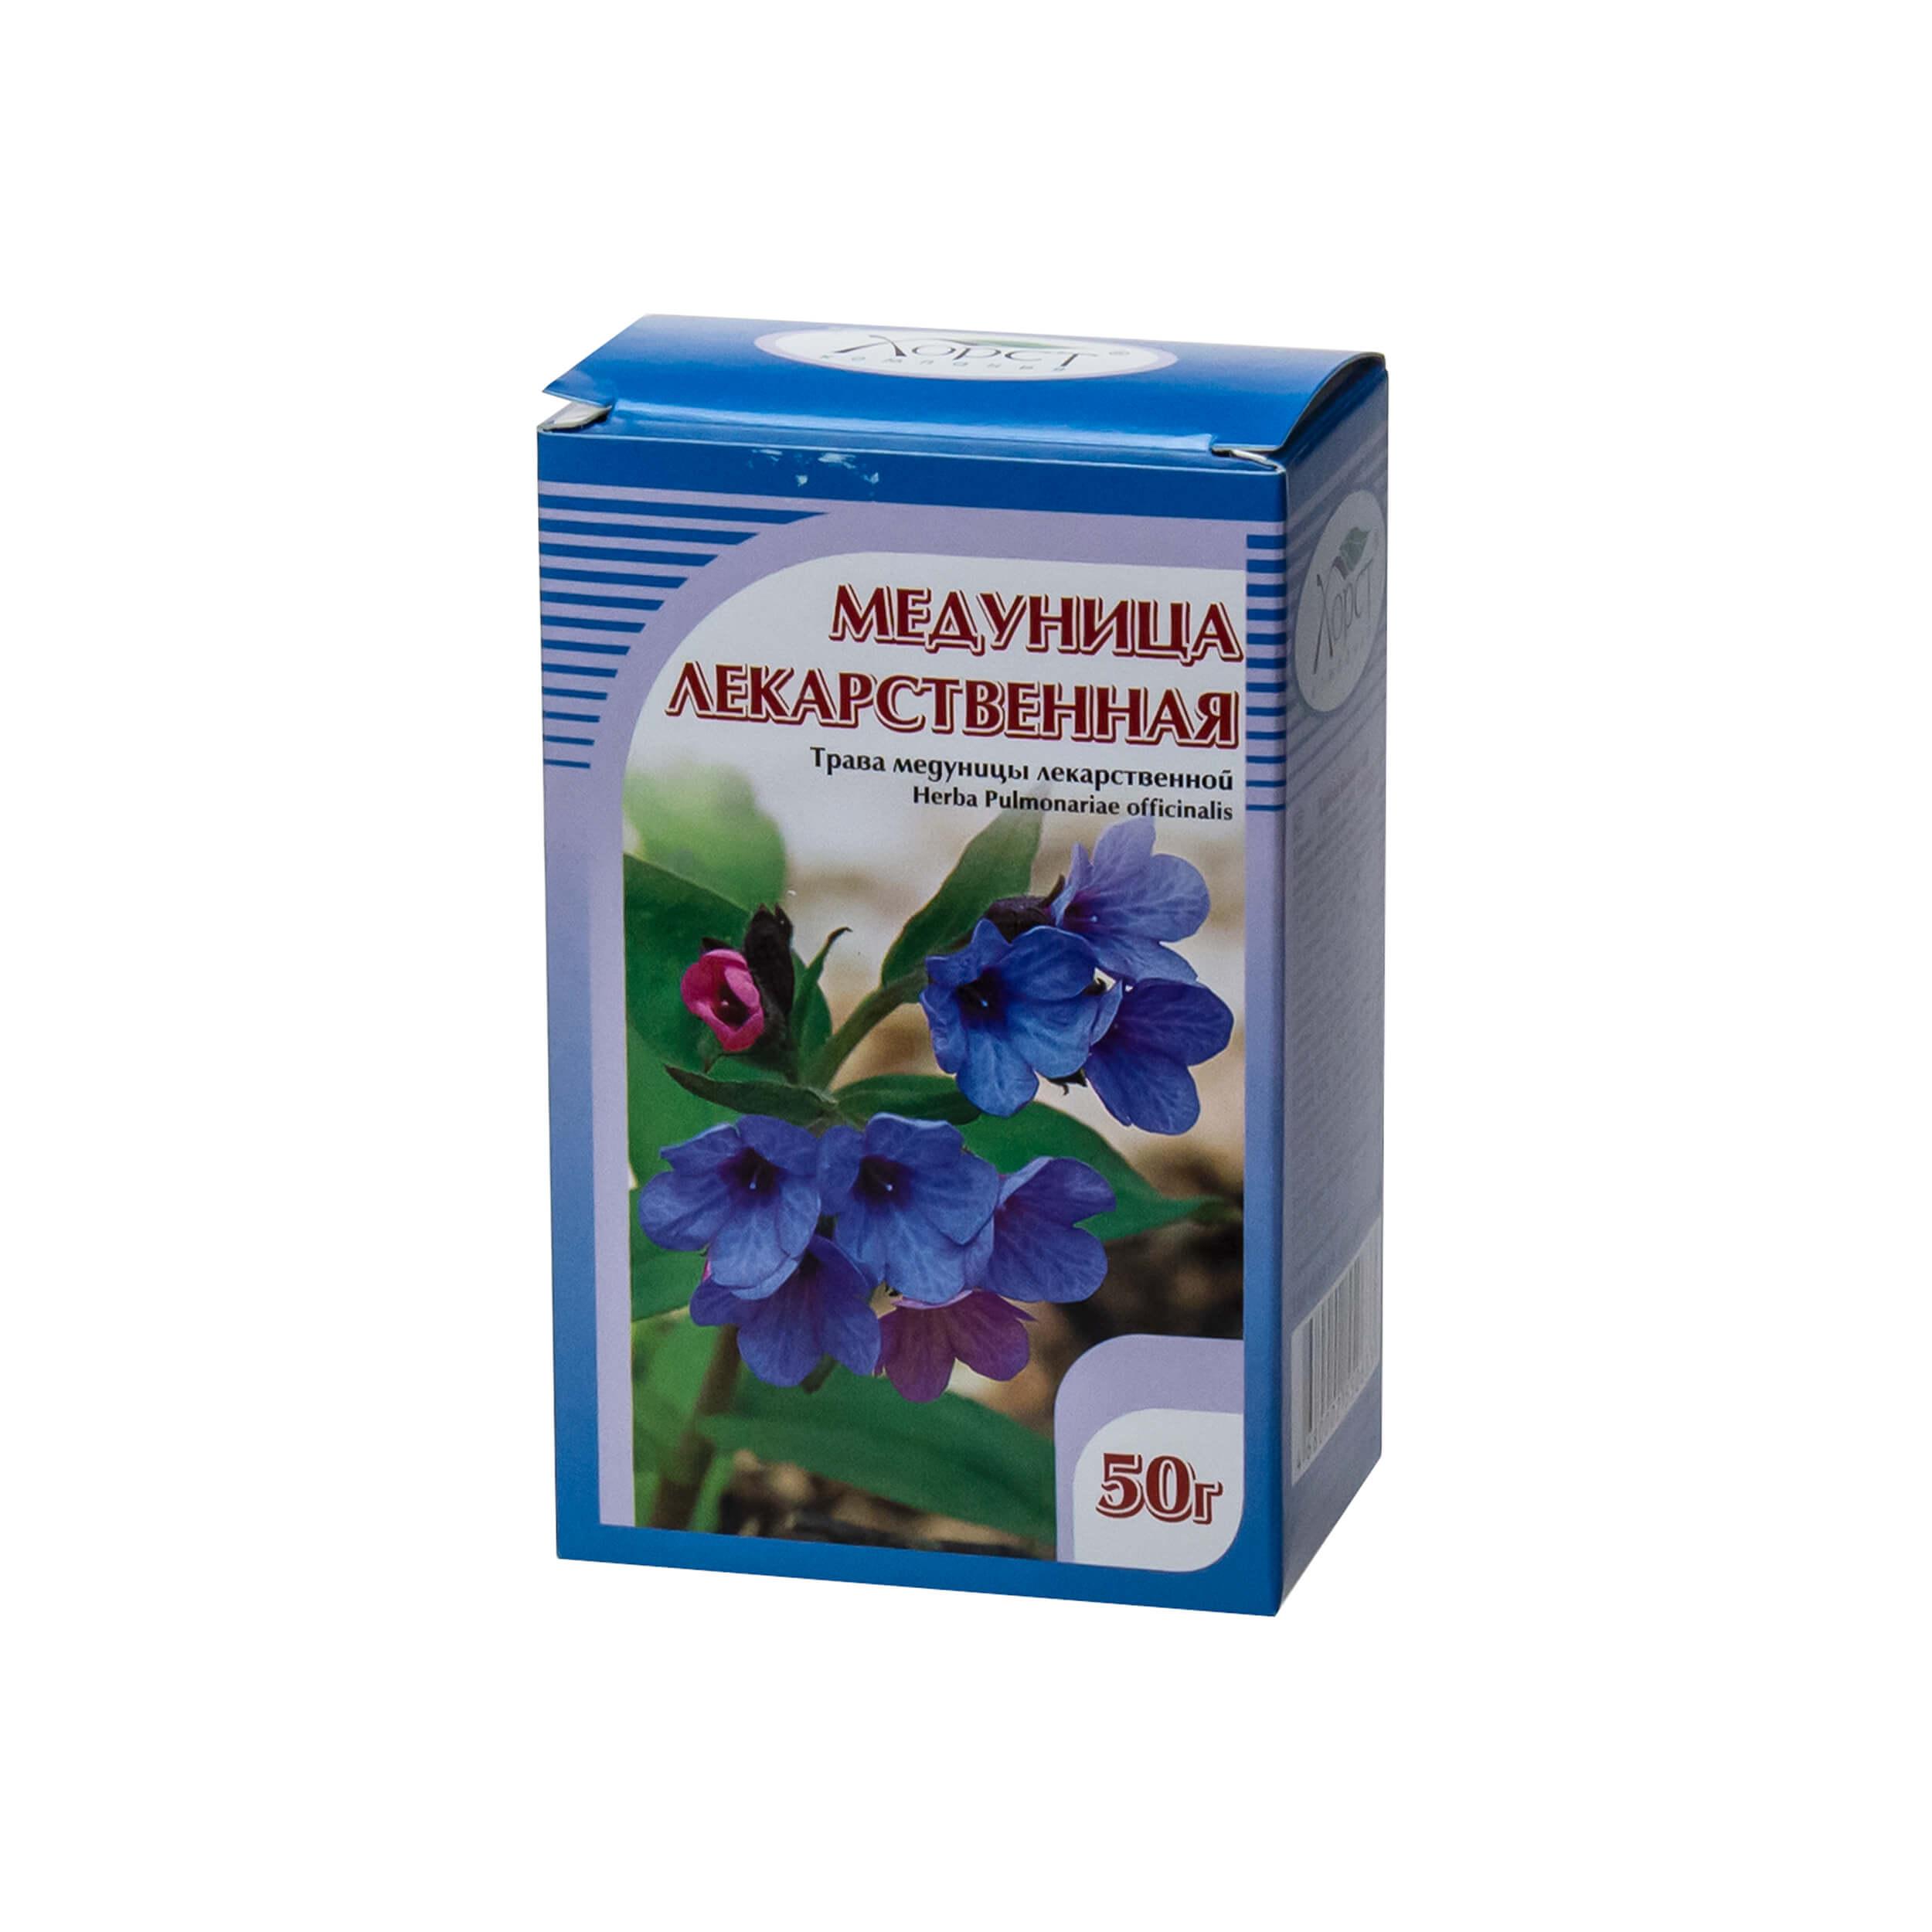 Медуница лекарственная (трава, 50 грамм) фото